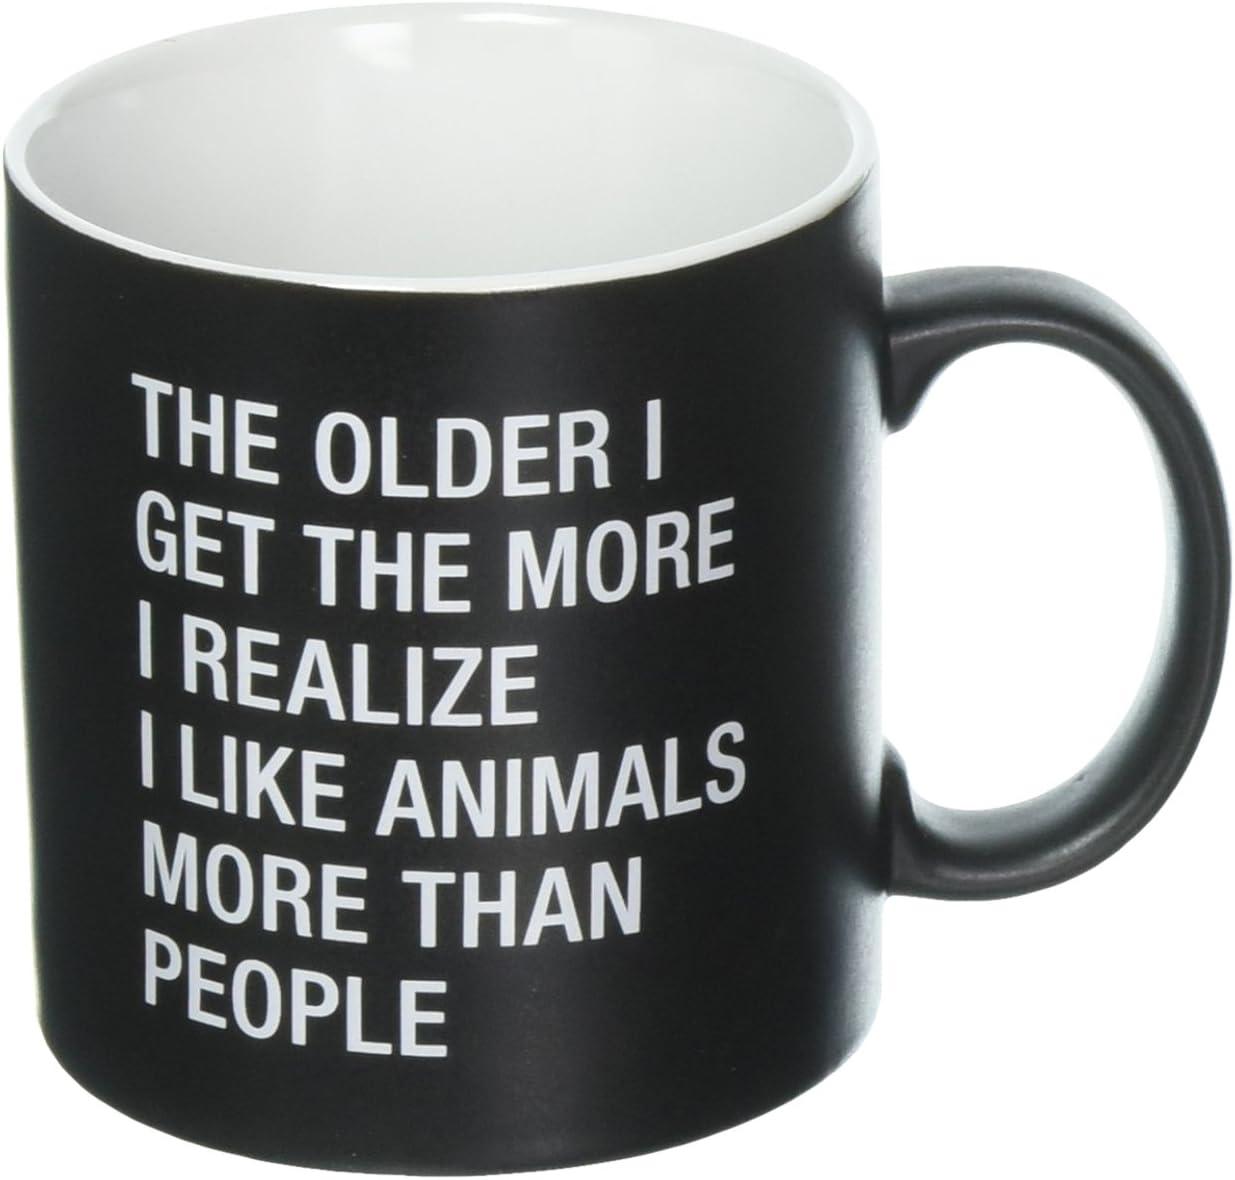 About Face Designs Like Animals More Than People 13 Oz Ceramic Stoneware Coffee Mug, 20 oz, Black